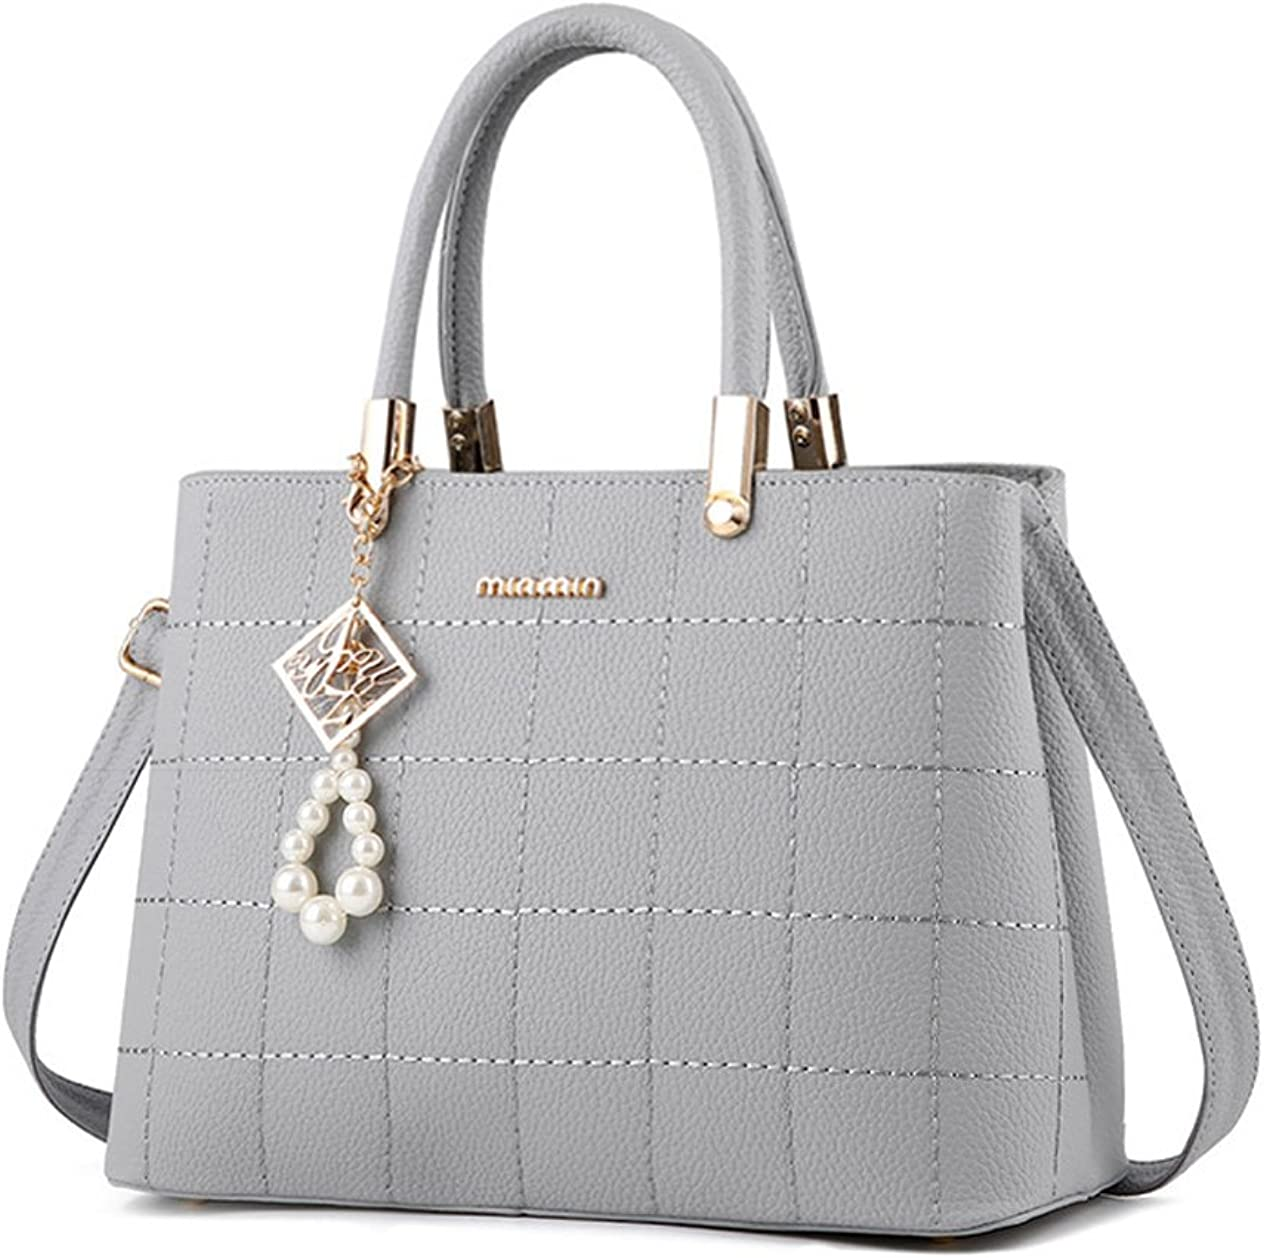 Ruiyee Womens Top Handle Satchel Handbags New Pearl Pendant Embroidered lady Shoulder Bag Messenger Tote Bag Purse PU Leather grey